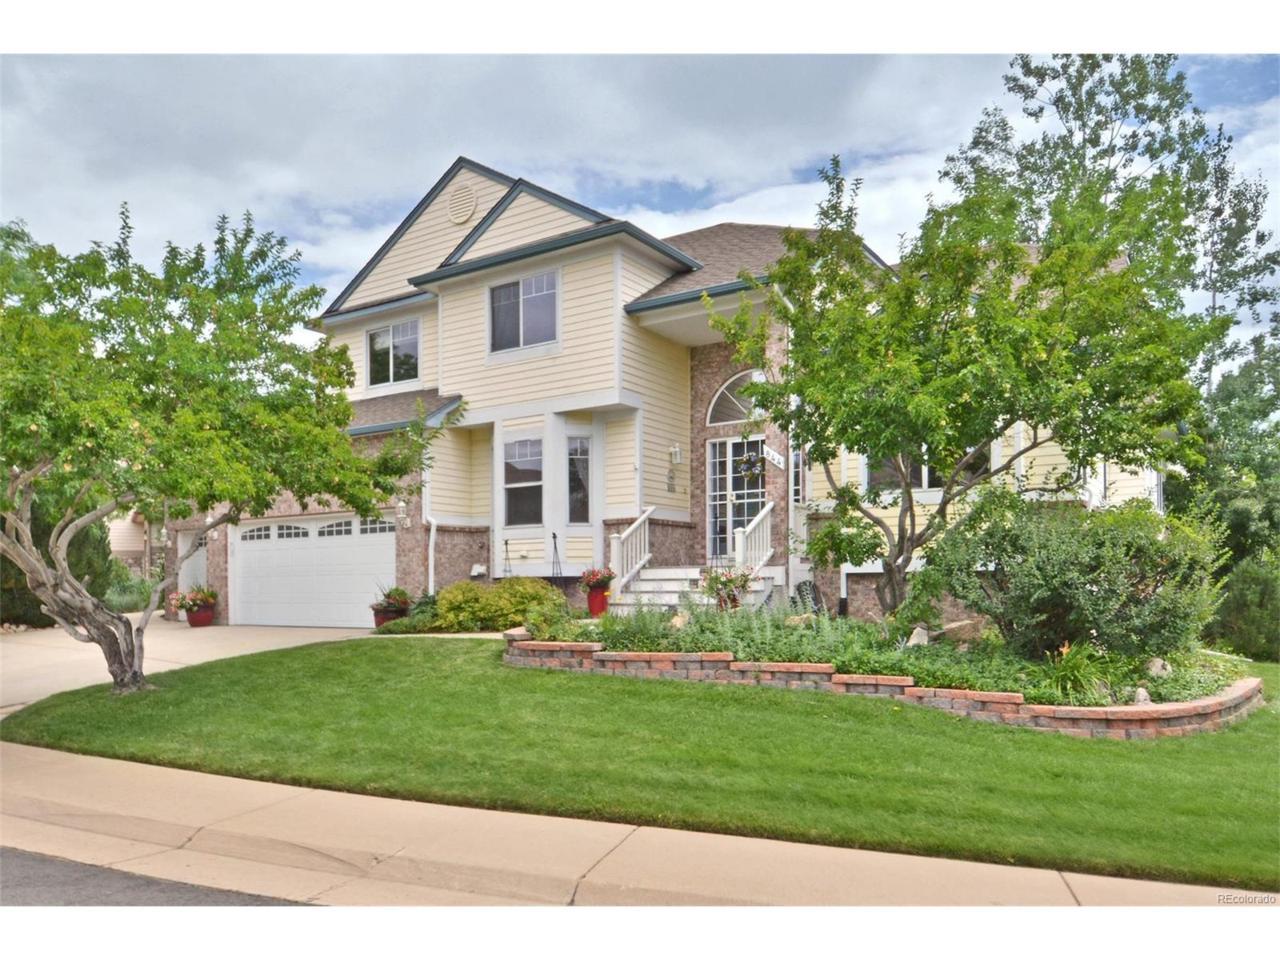 844 Trail Ridge Drive, Louisville, CO 80027 (MLS #4803876) :: 8z Real Estate